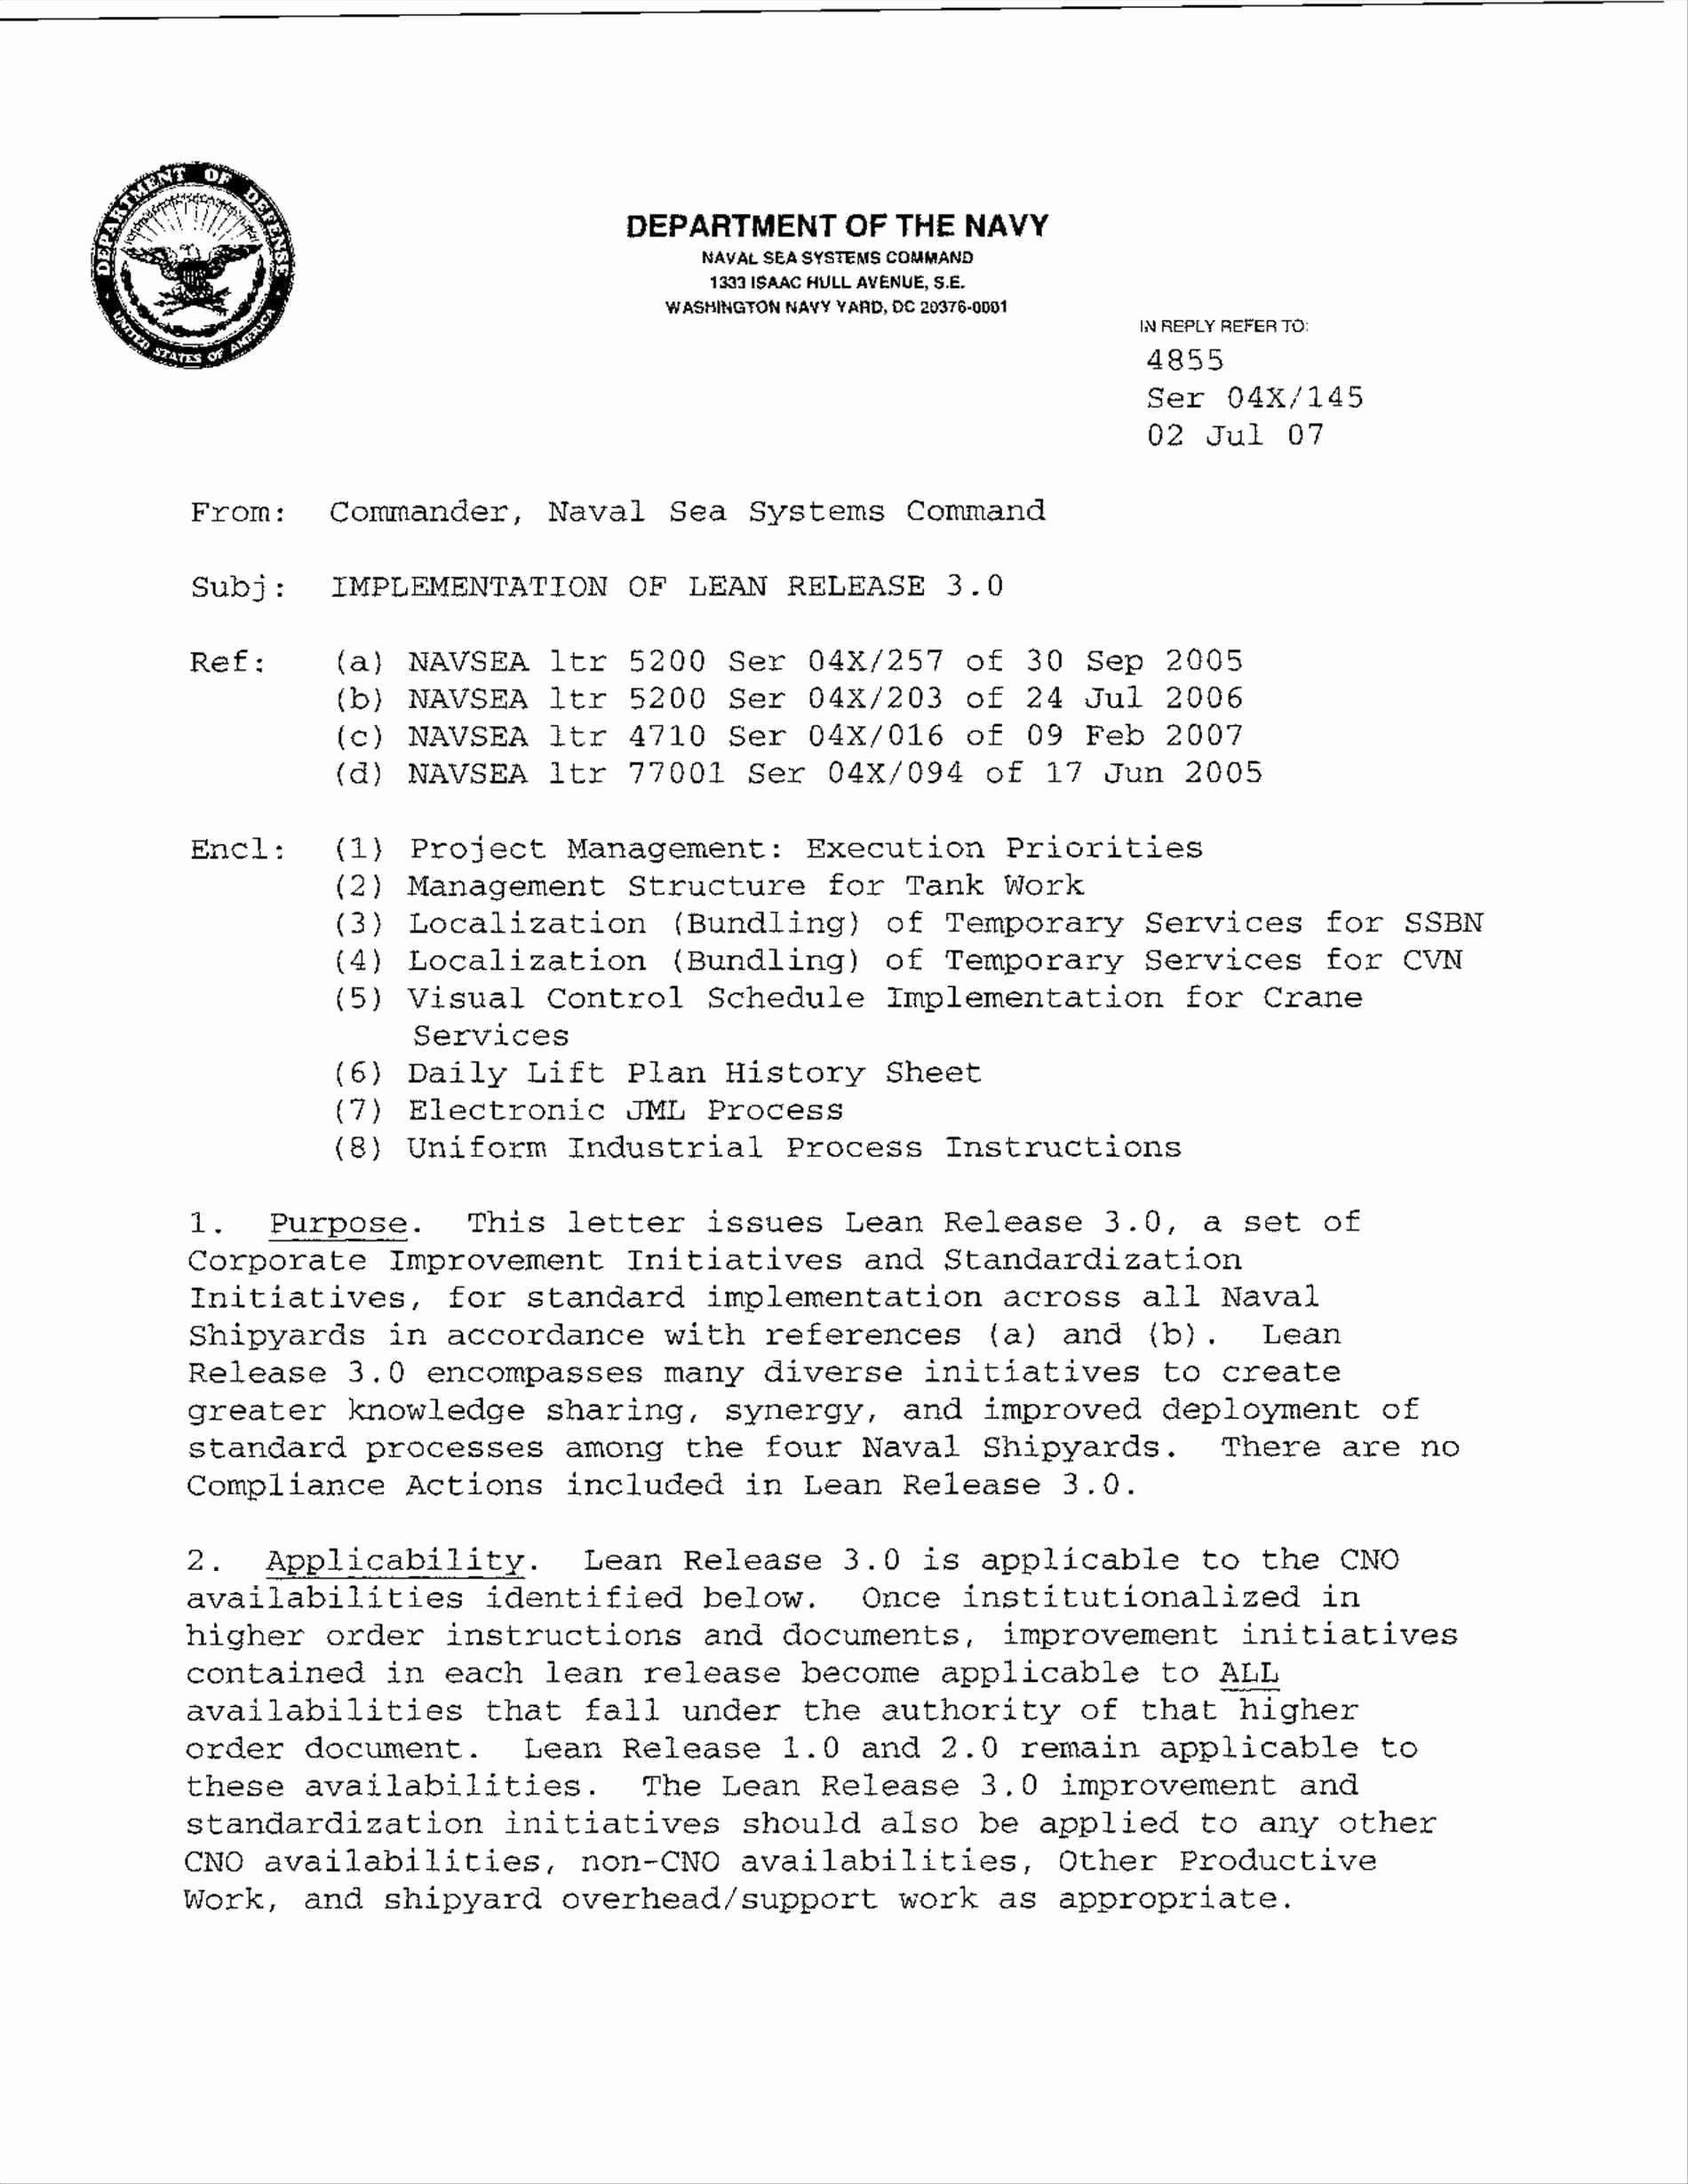 Warning order Template Usmc Elegant Navy Pcs orders Example Hashtag Bg